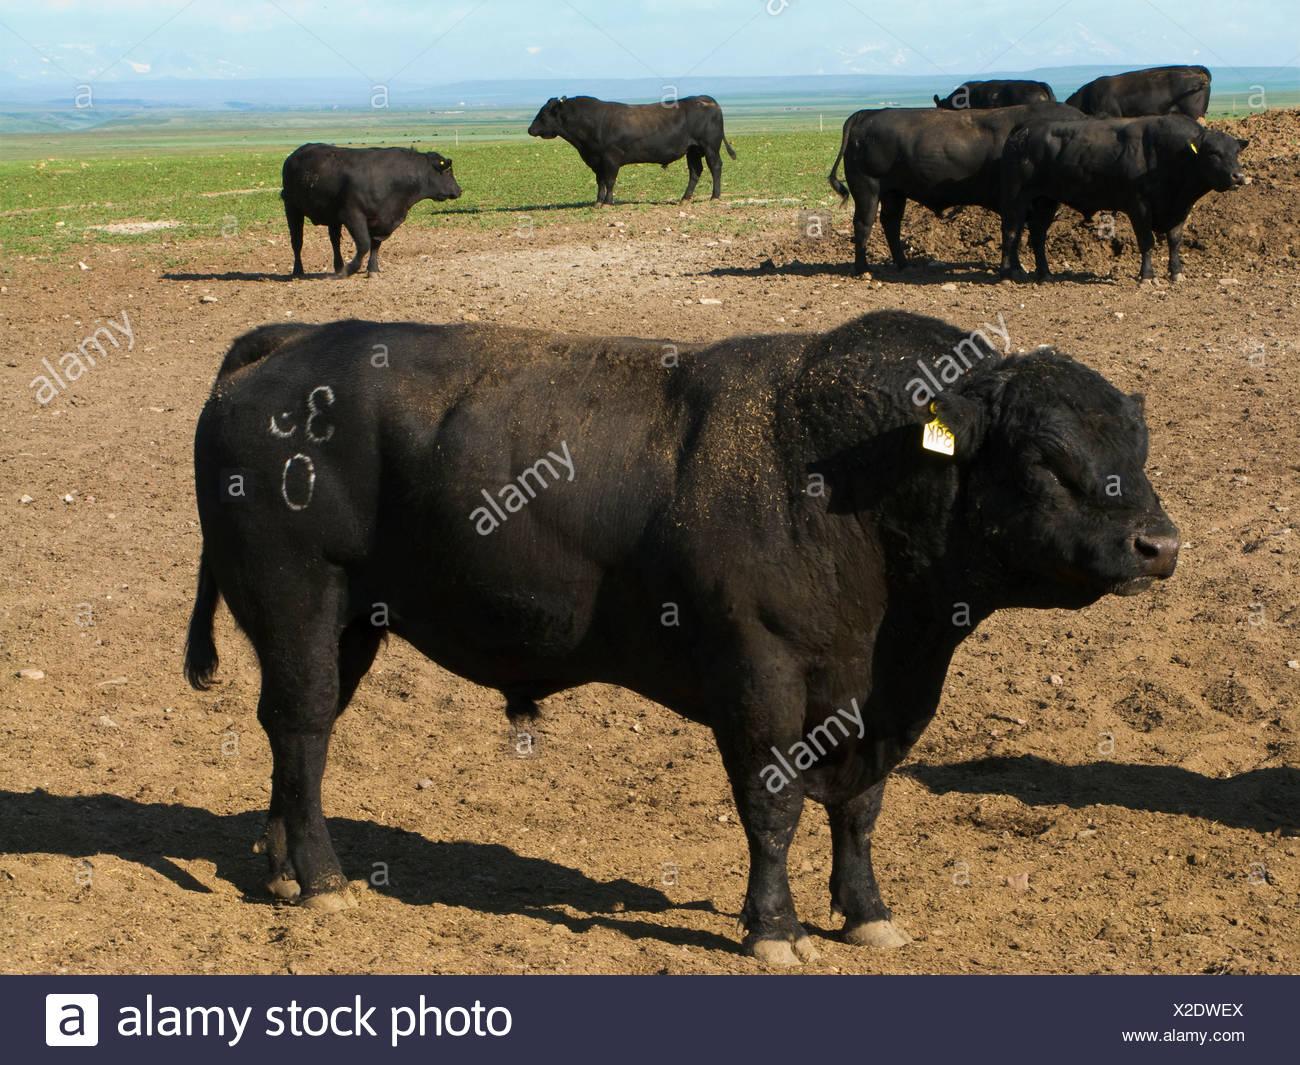 Livestock - Black Angus bulls on an open pasture / Alberta, Canada. - Stock Image